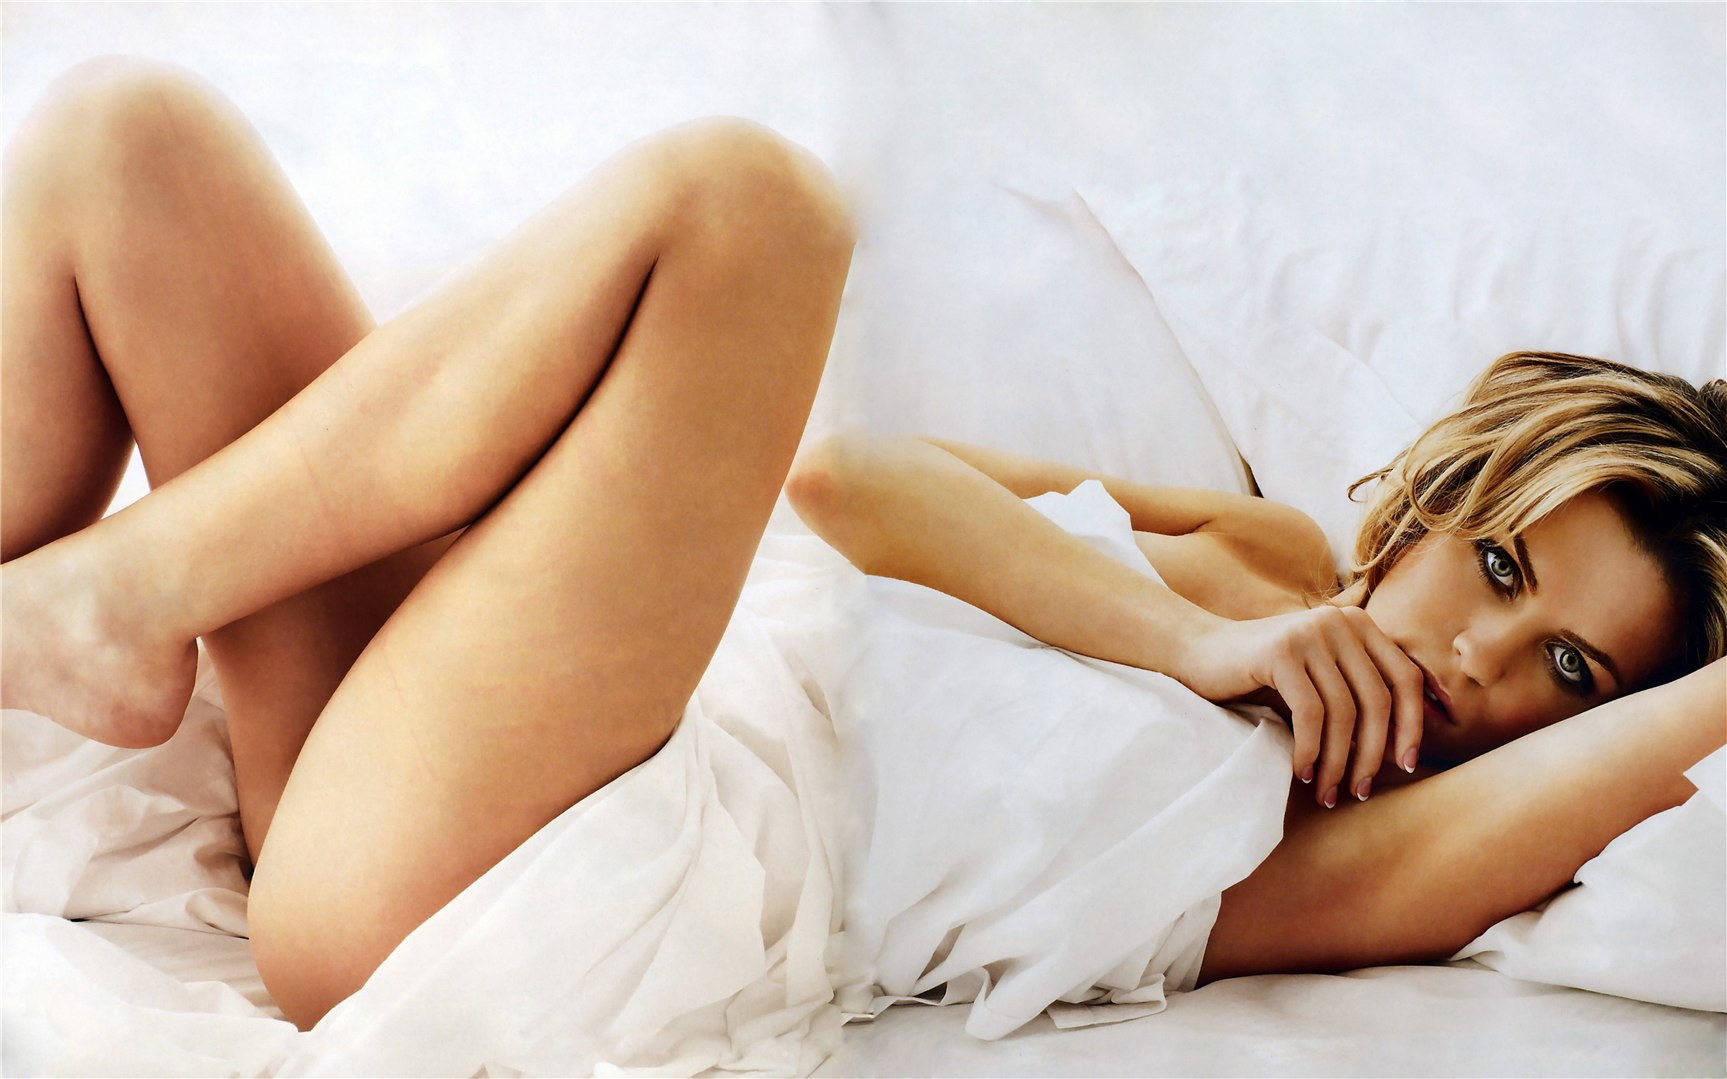 модель Эбби Клэнси / Abbey Clancy, фотограф Dan Annett